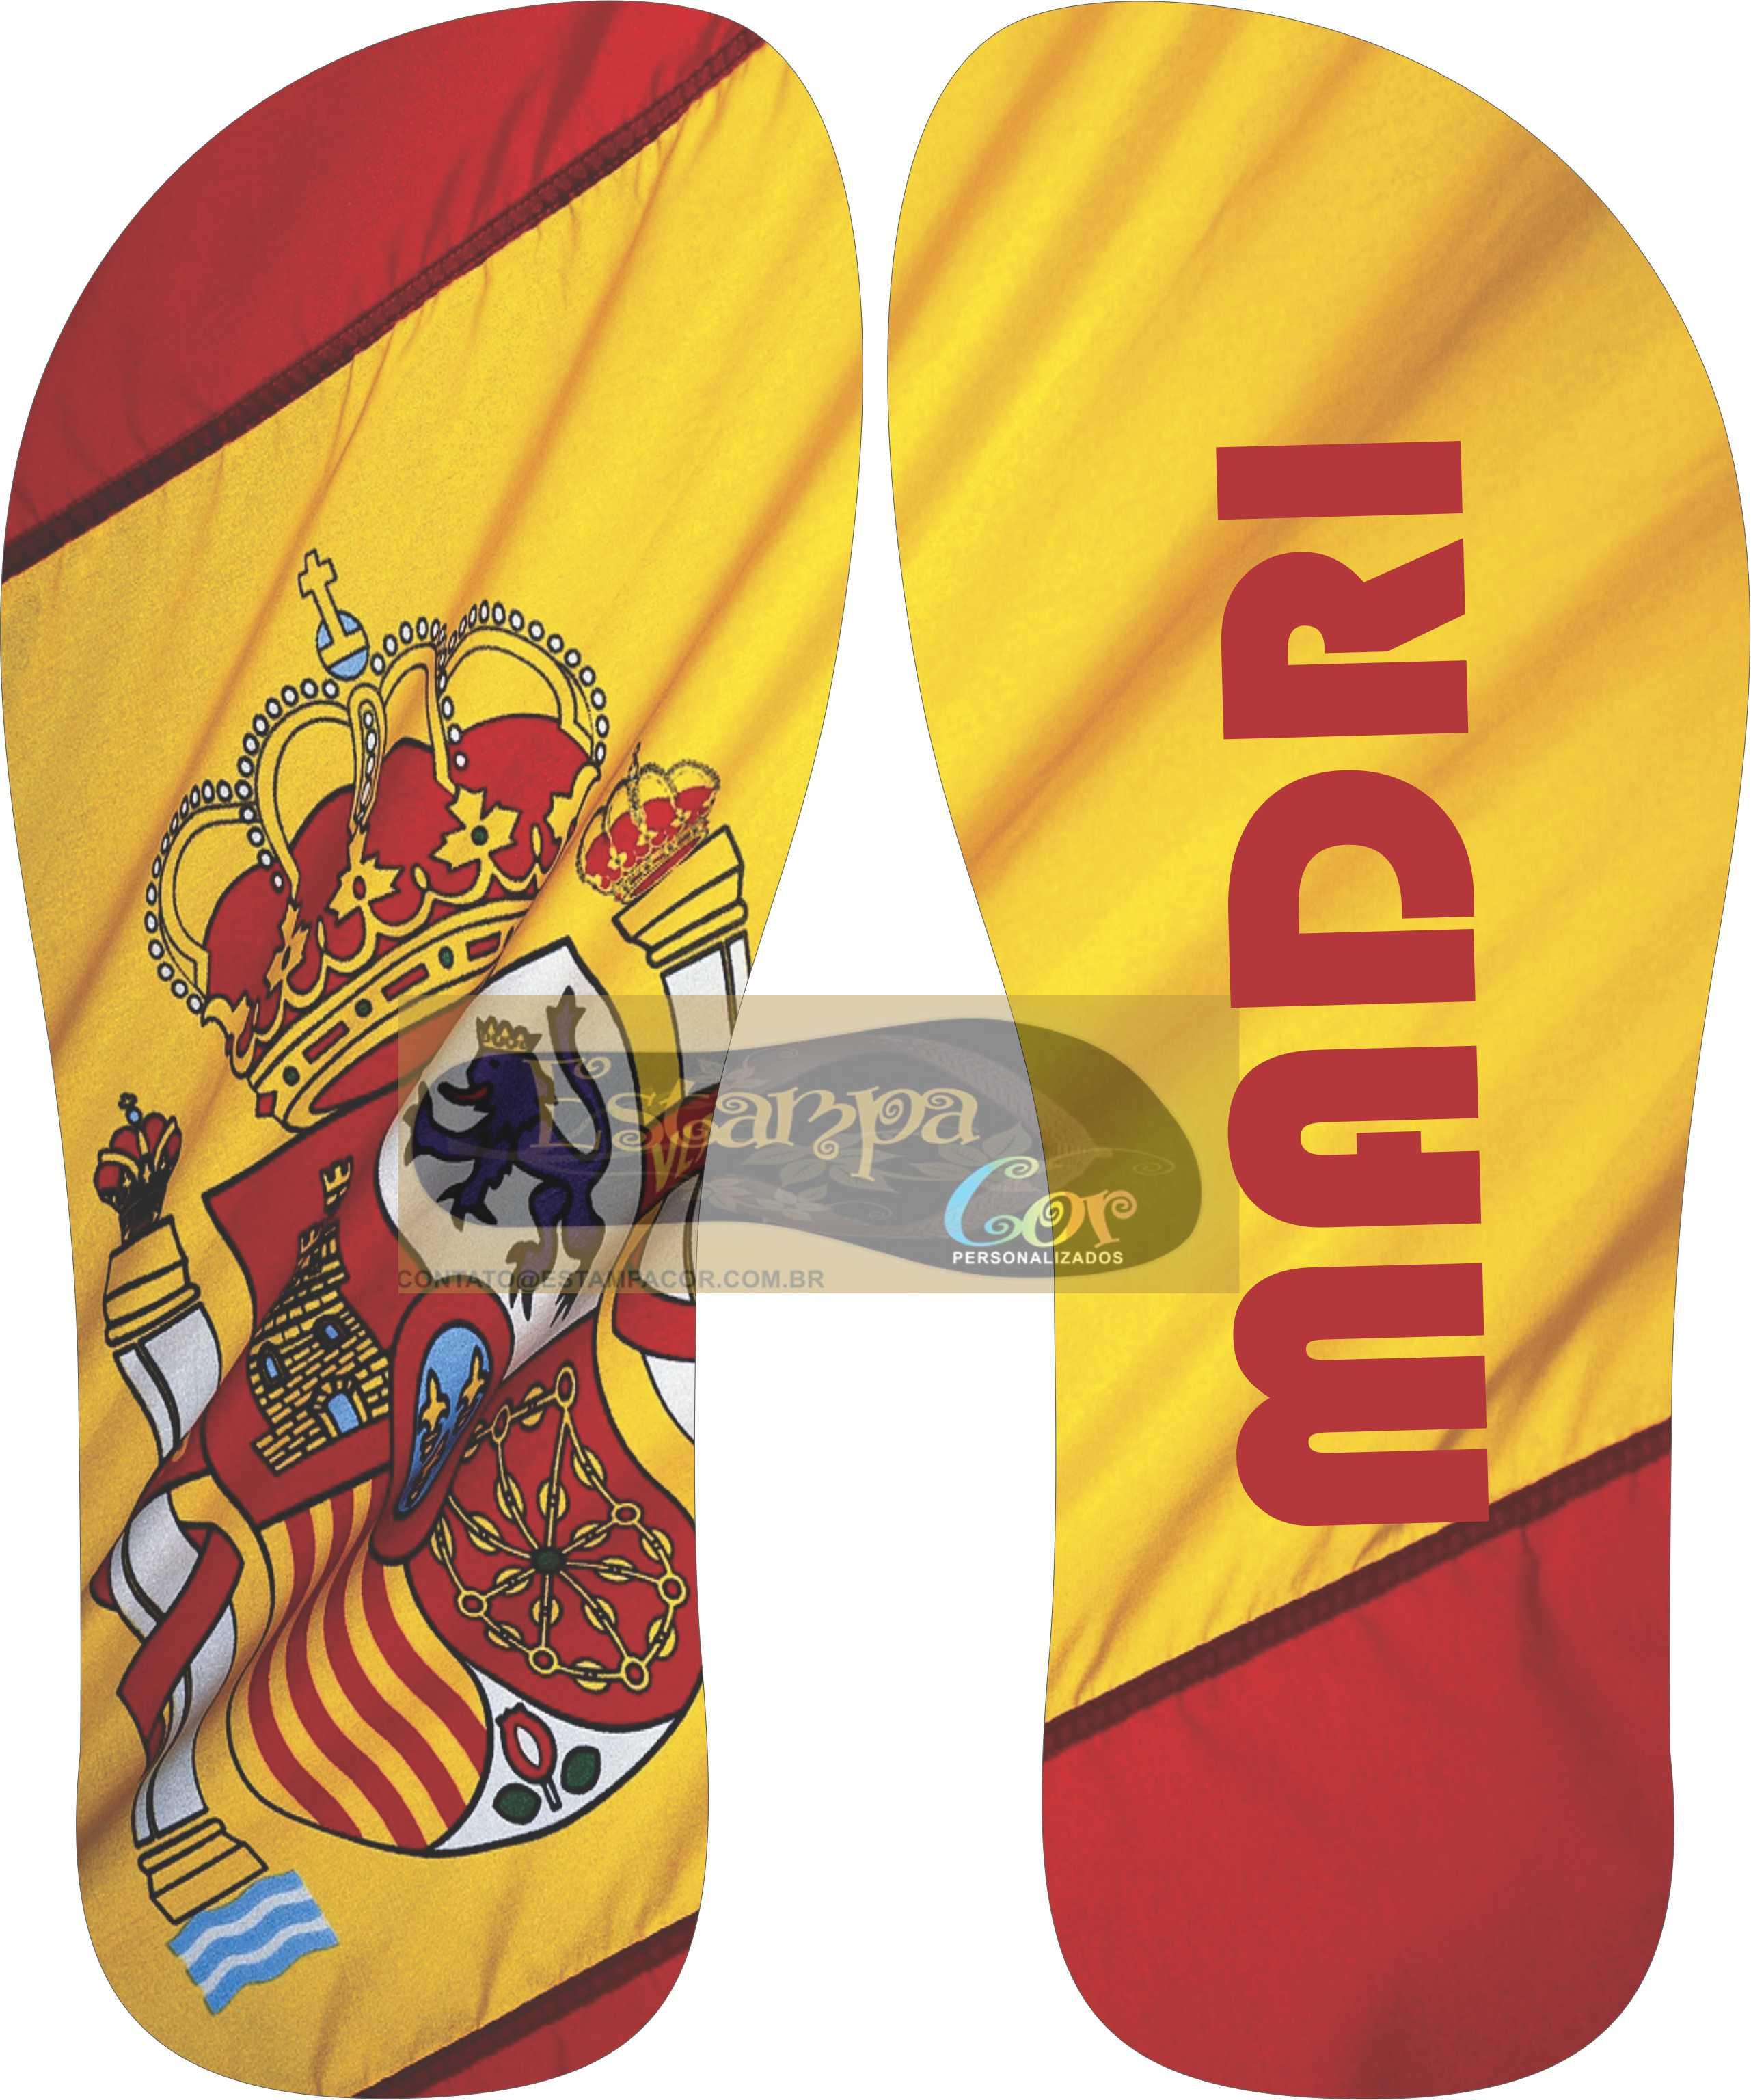 Chinelo Personalizado Madri